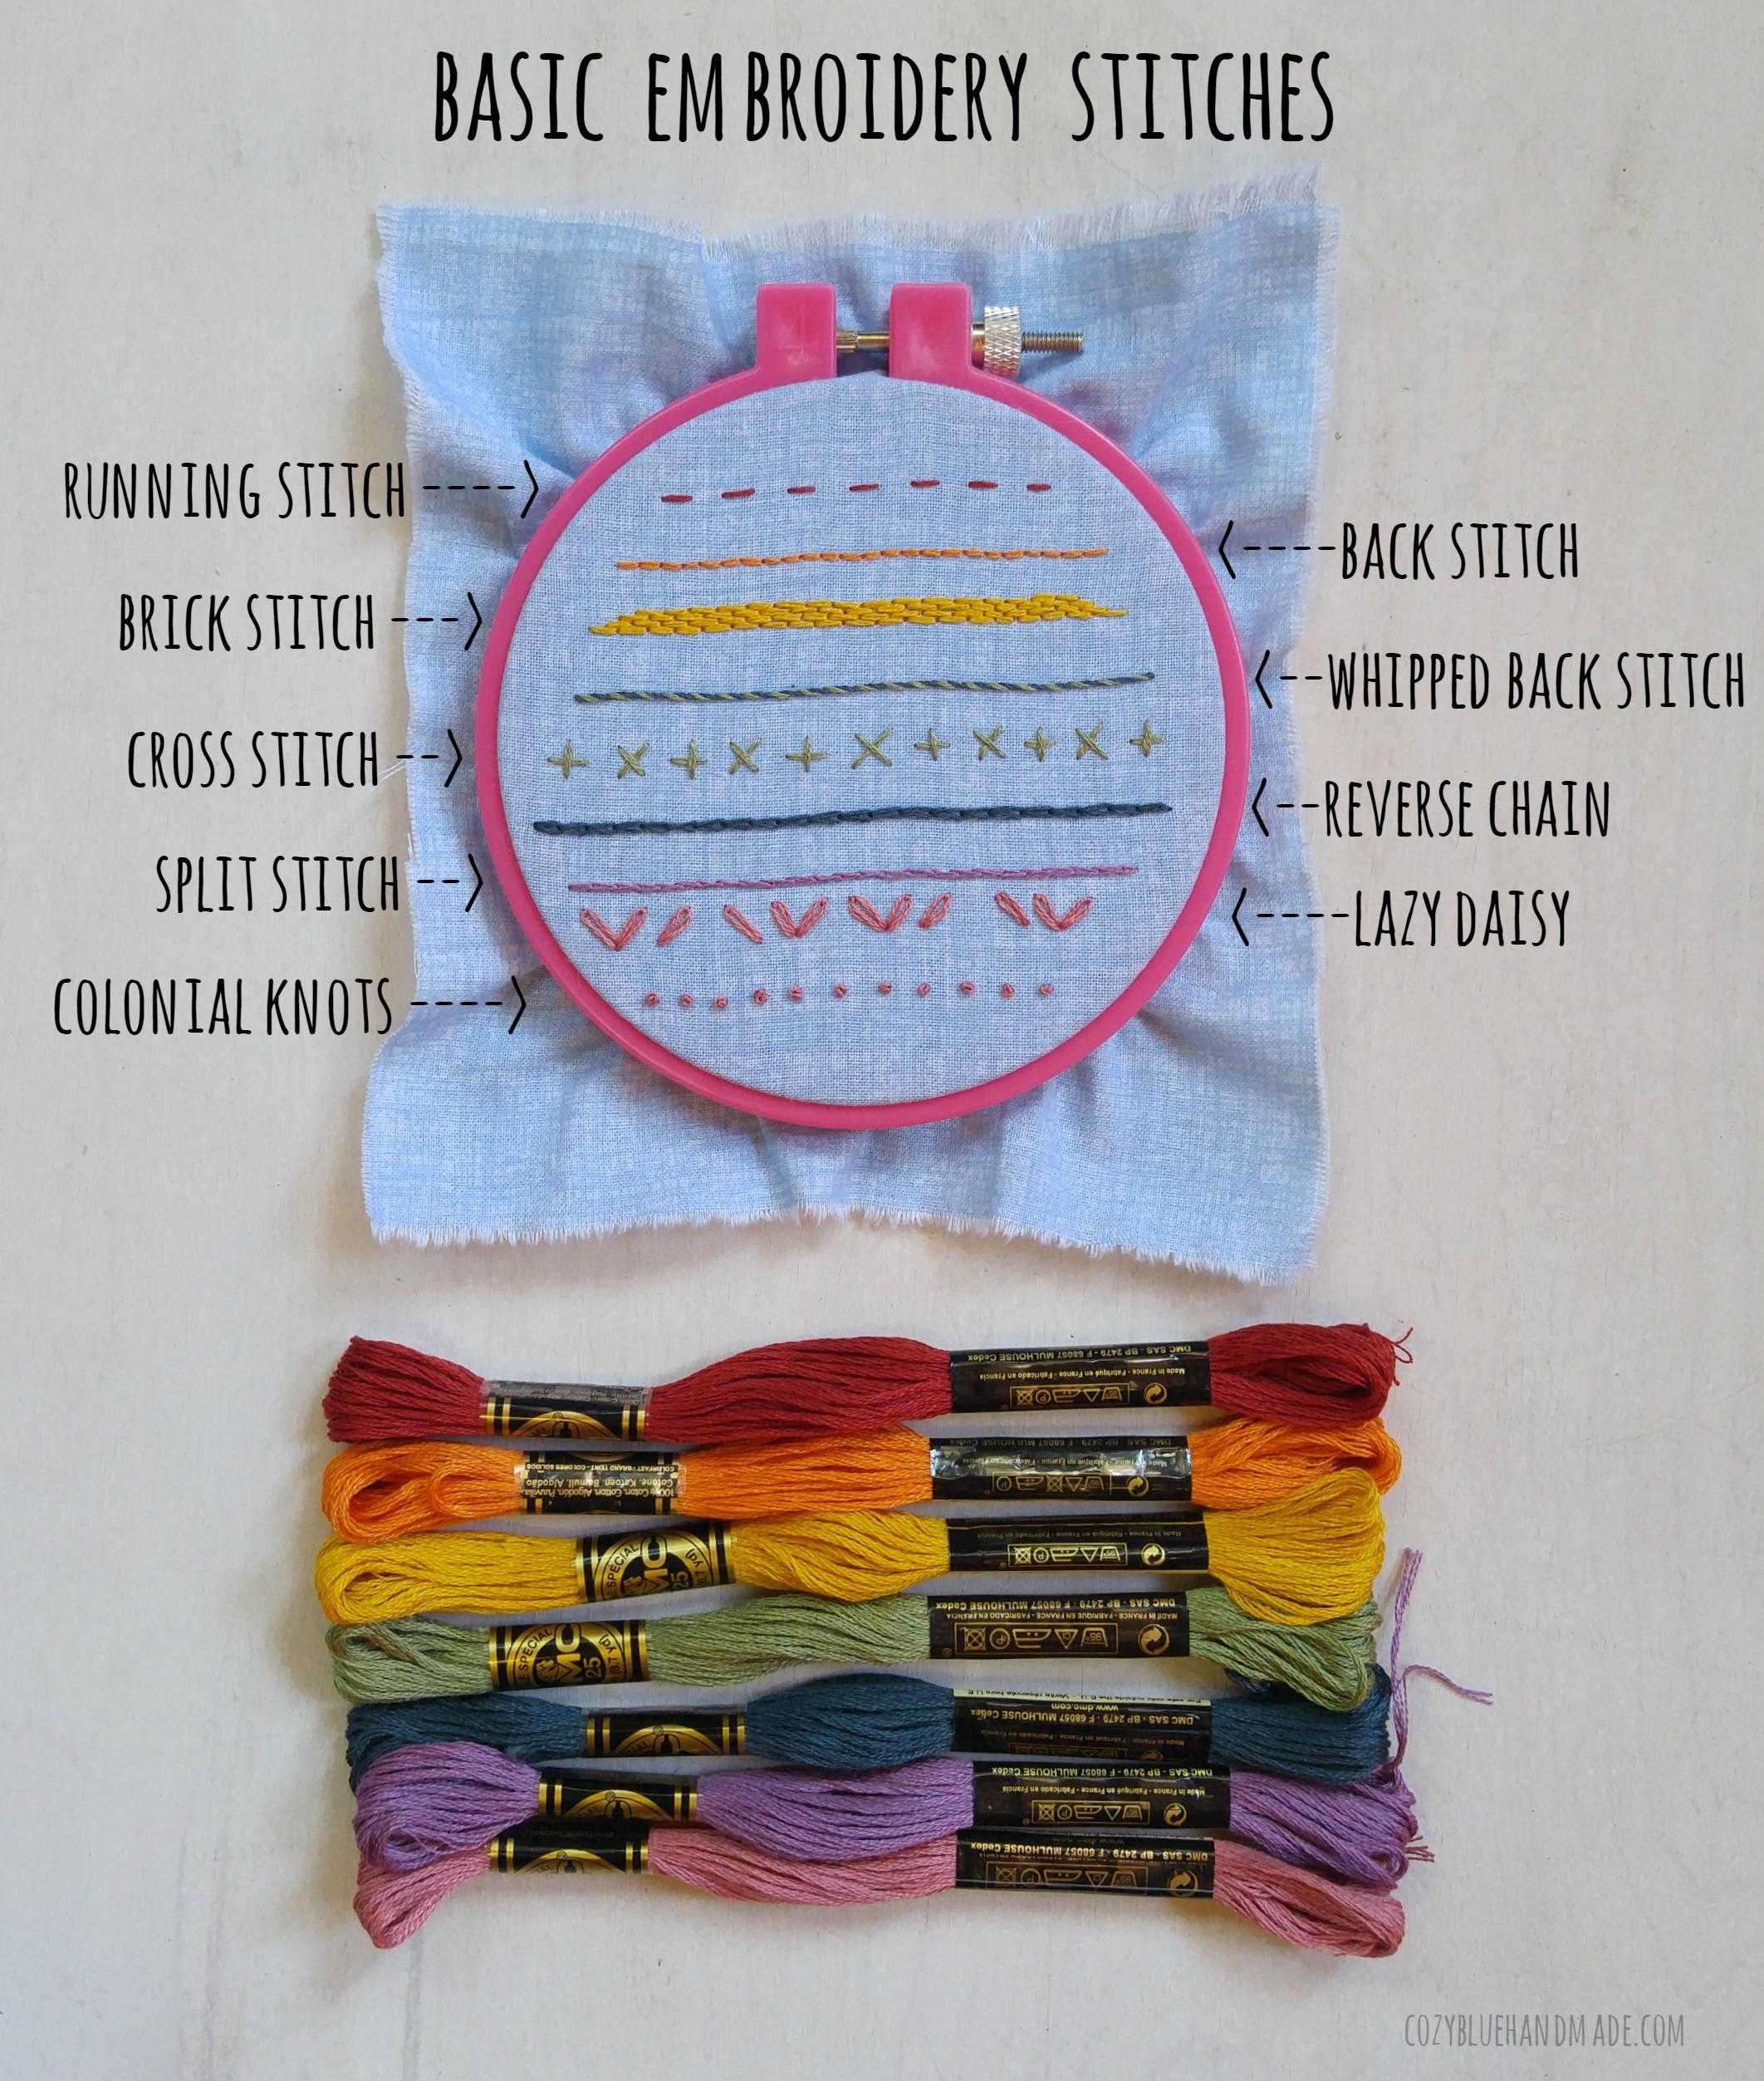 basic embroidery stitches.jpg